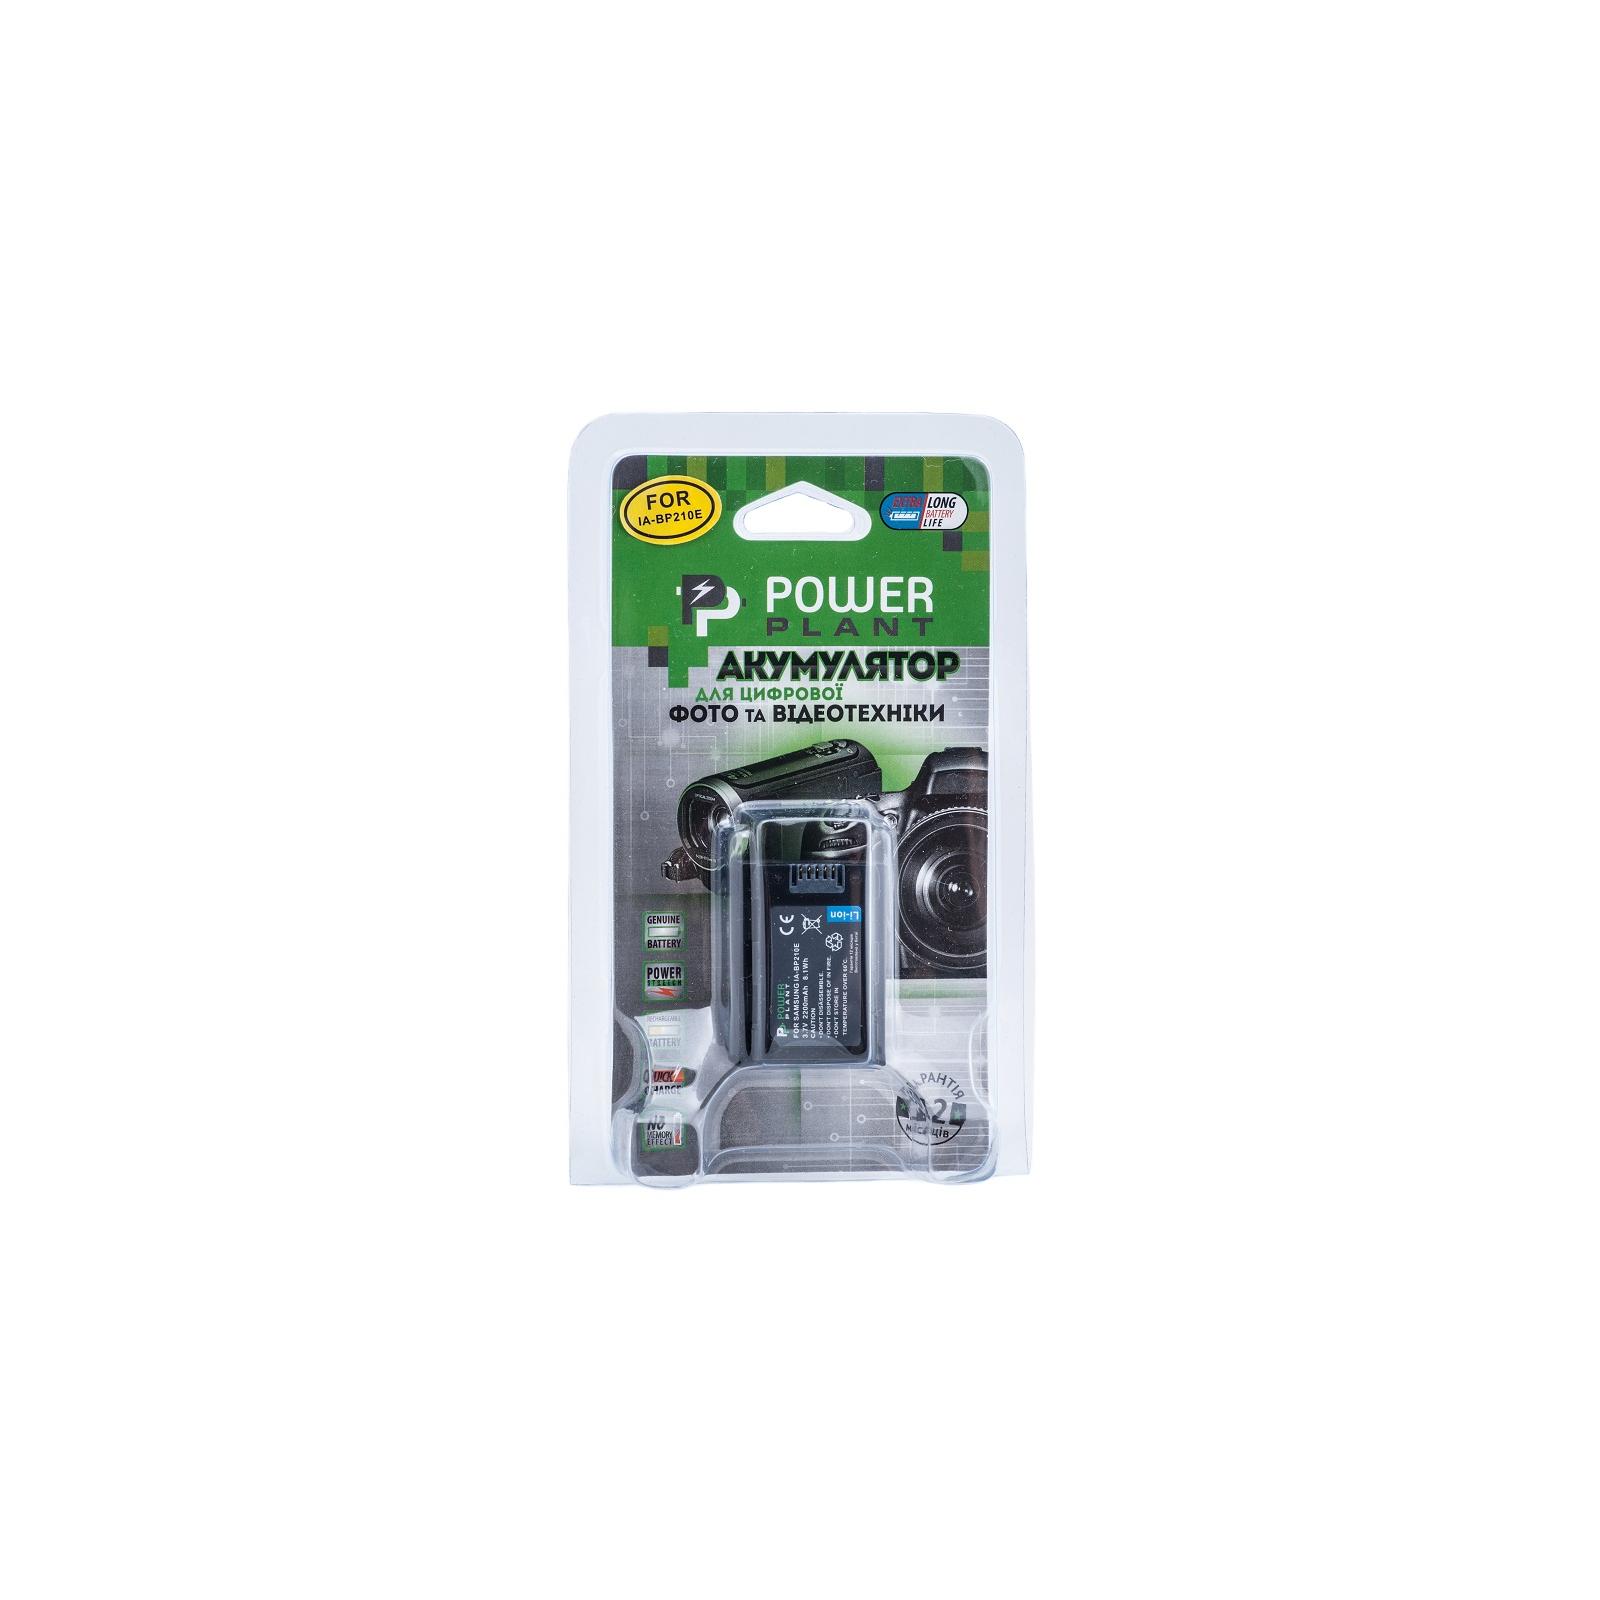 Аккумулятор к фото/видео PowerPlant Samsung IA-BP210E (DV00DV1285) изображение 2